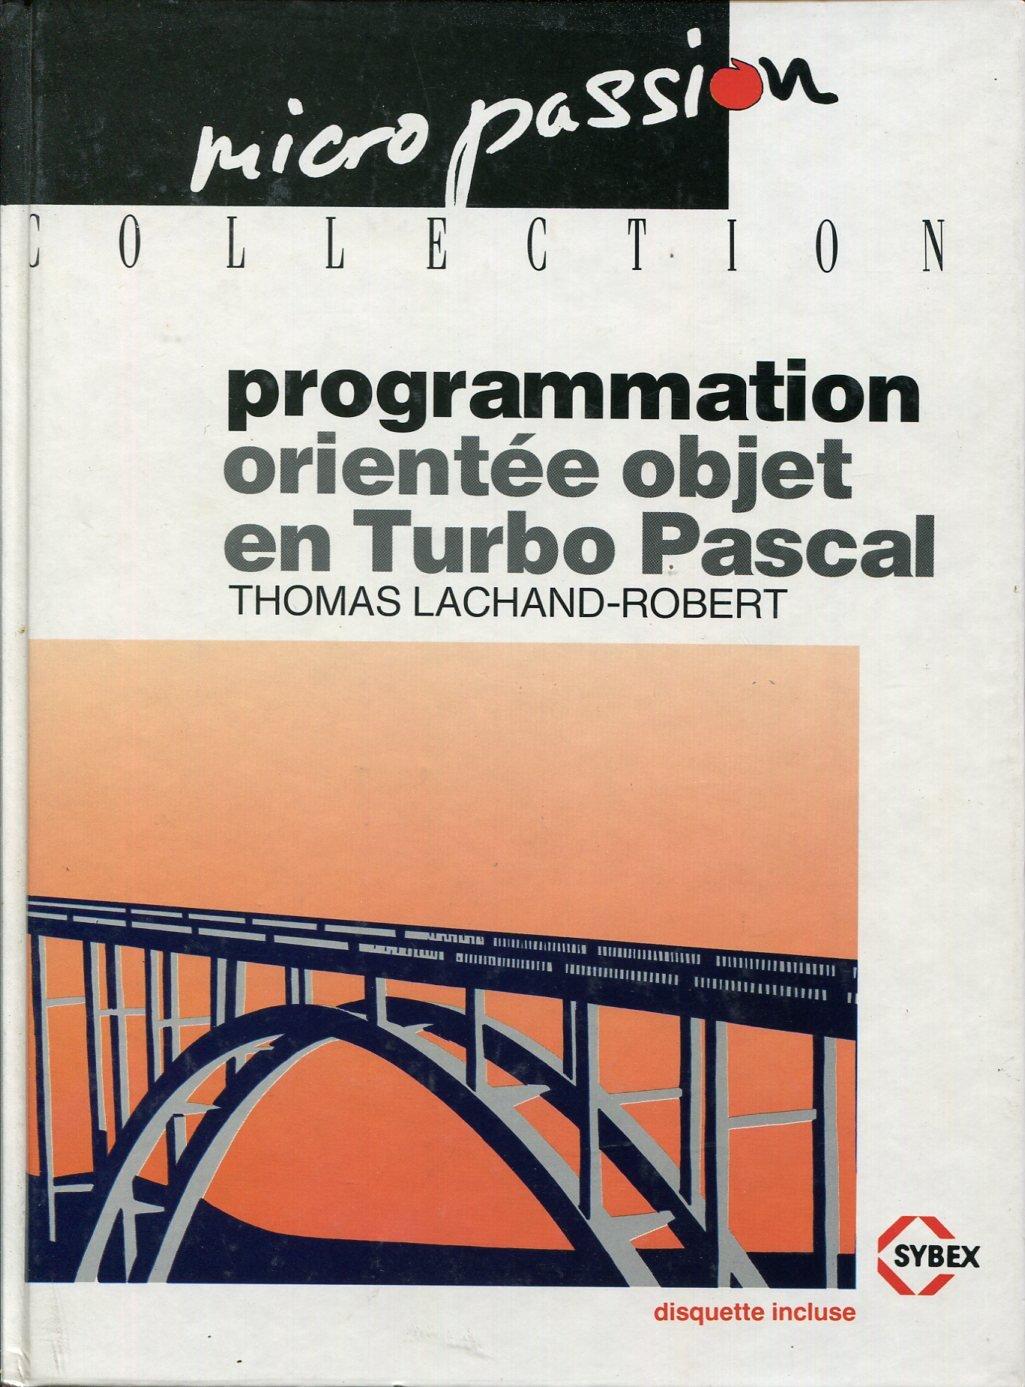 Programmation orientee objet en turbo pascal: Amazon.es: Lachand-Robert: Libros en idiomas extranjeros